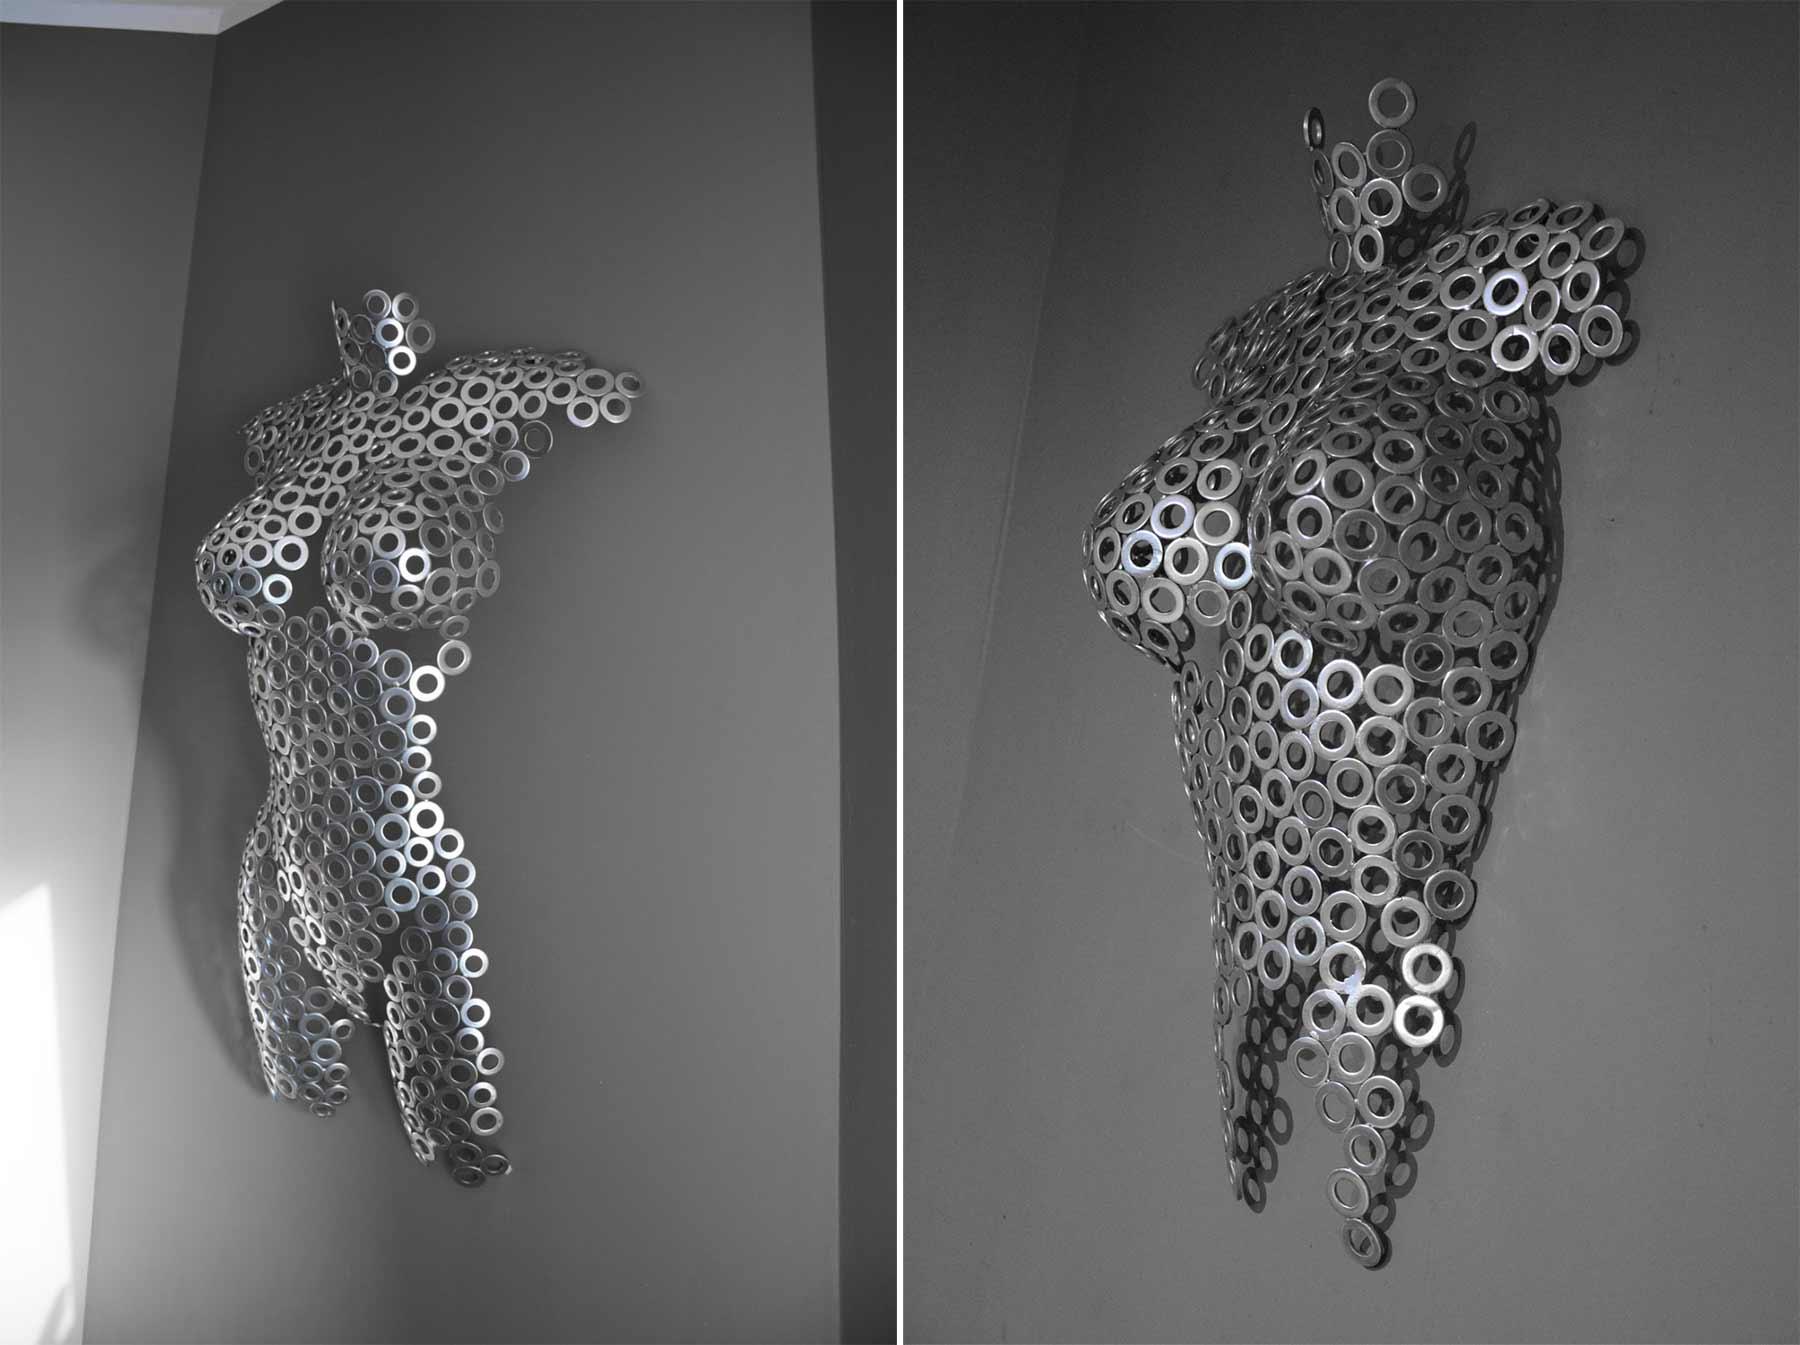 Metallfiguren aus Schrott Sebastian-Kucharski-Metallschrottfiguren_05